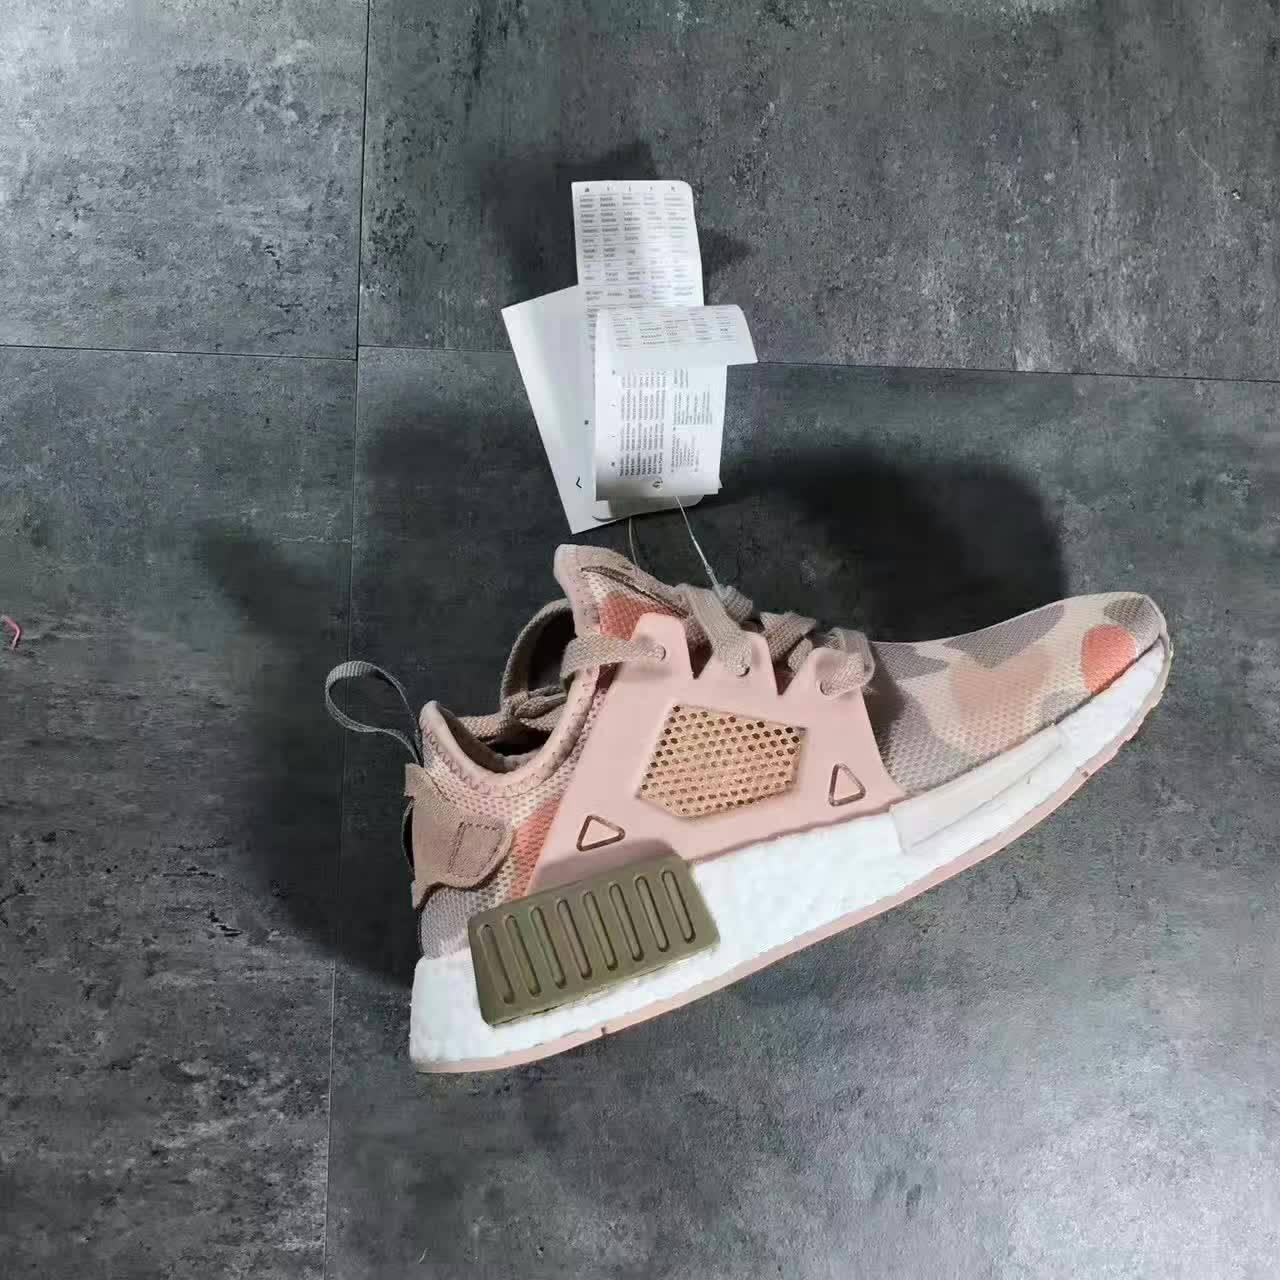 Adidas Nmd Xr1 粉迷彩休閒跑鞋 女款